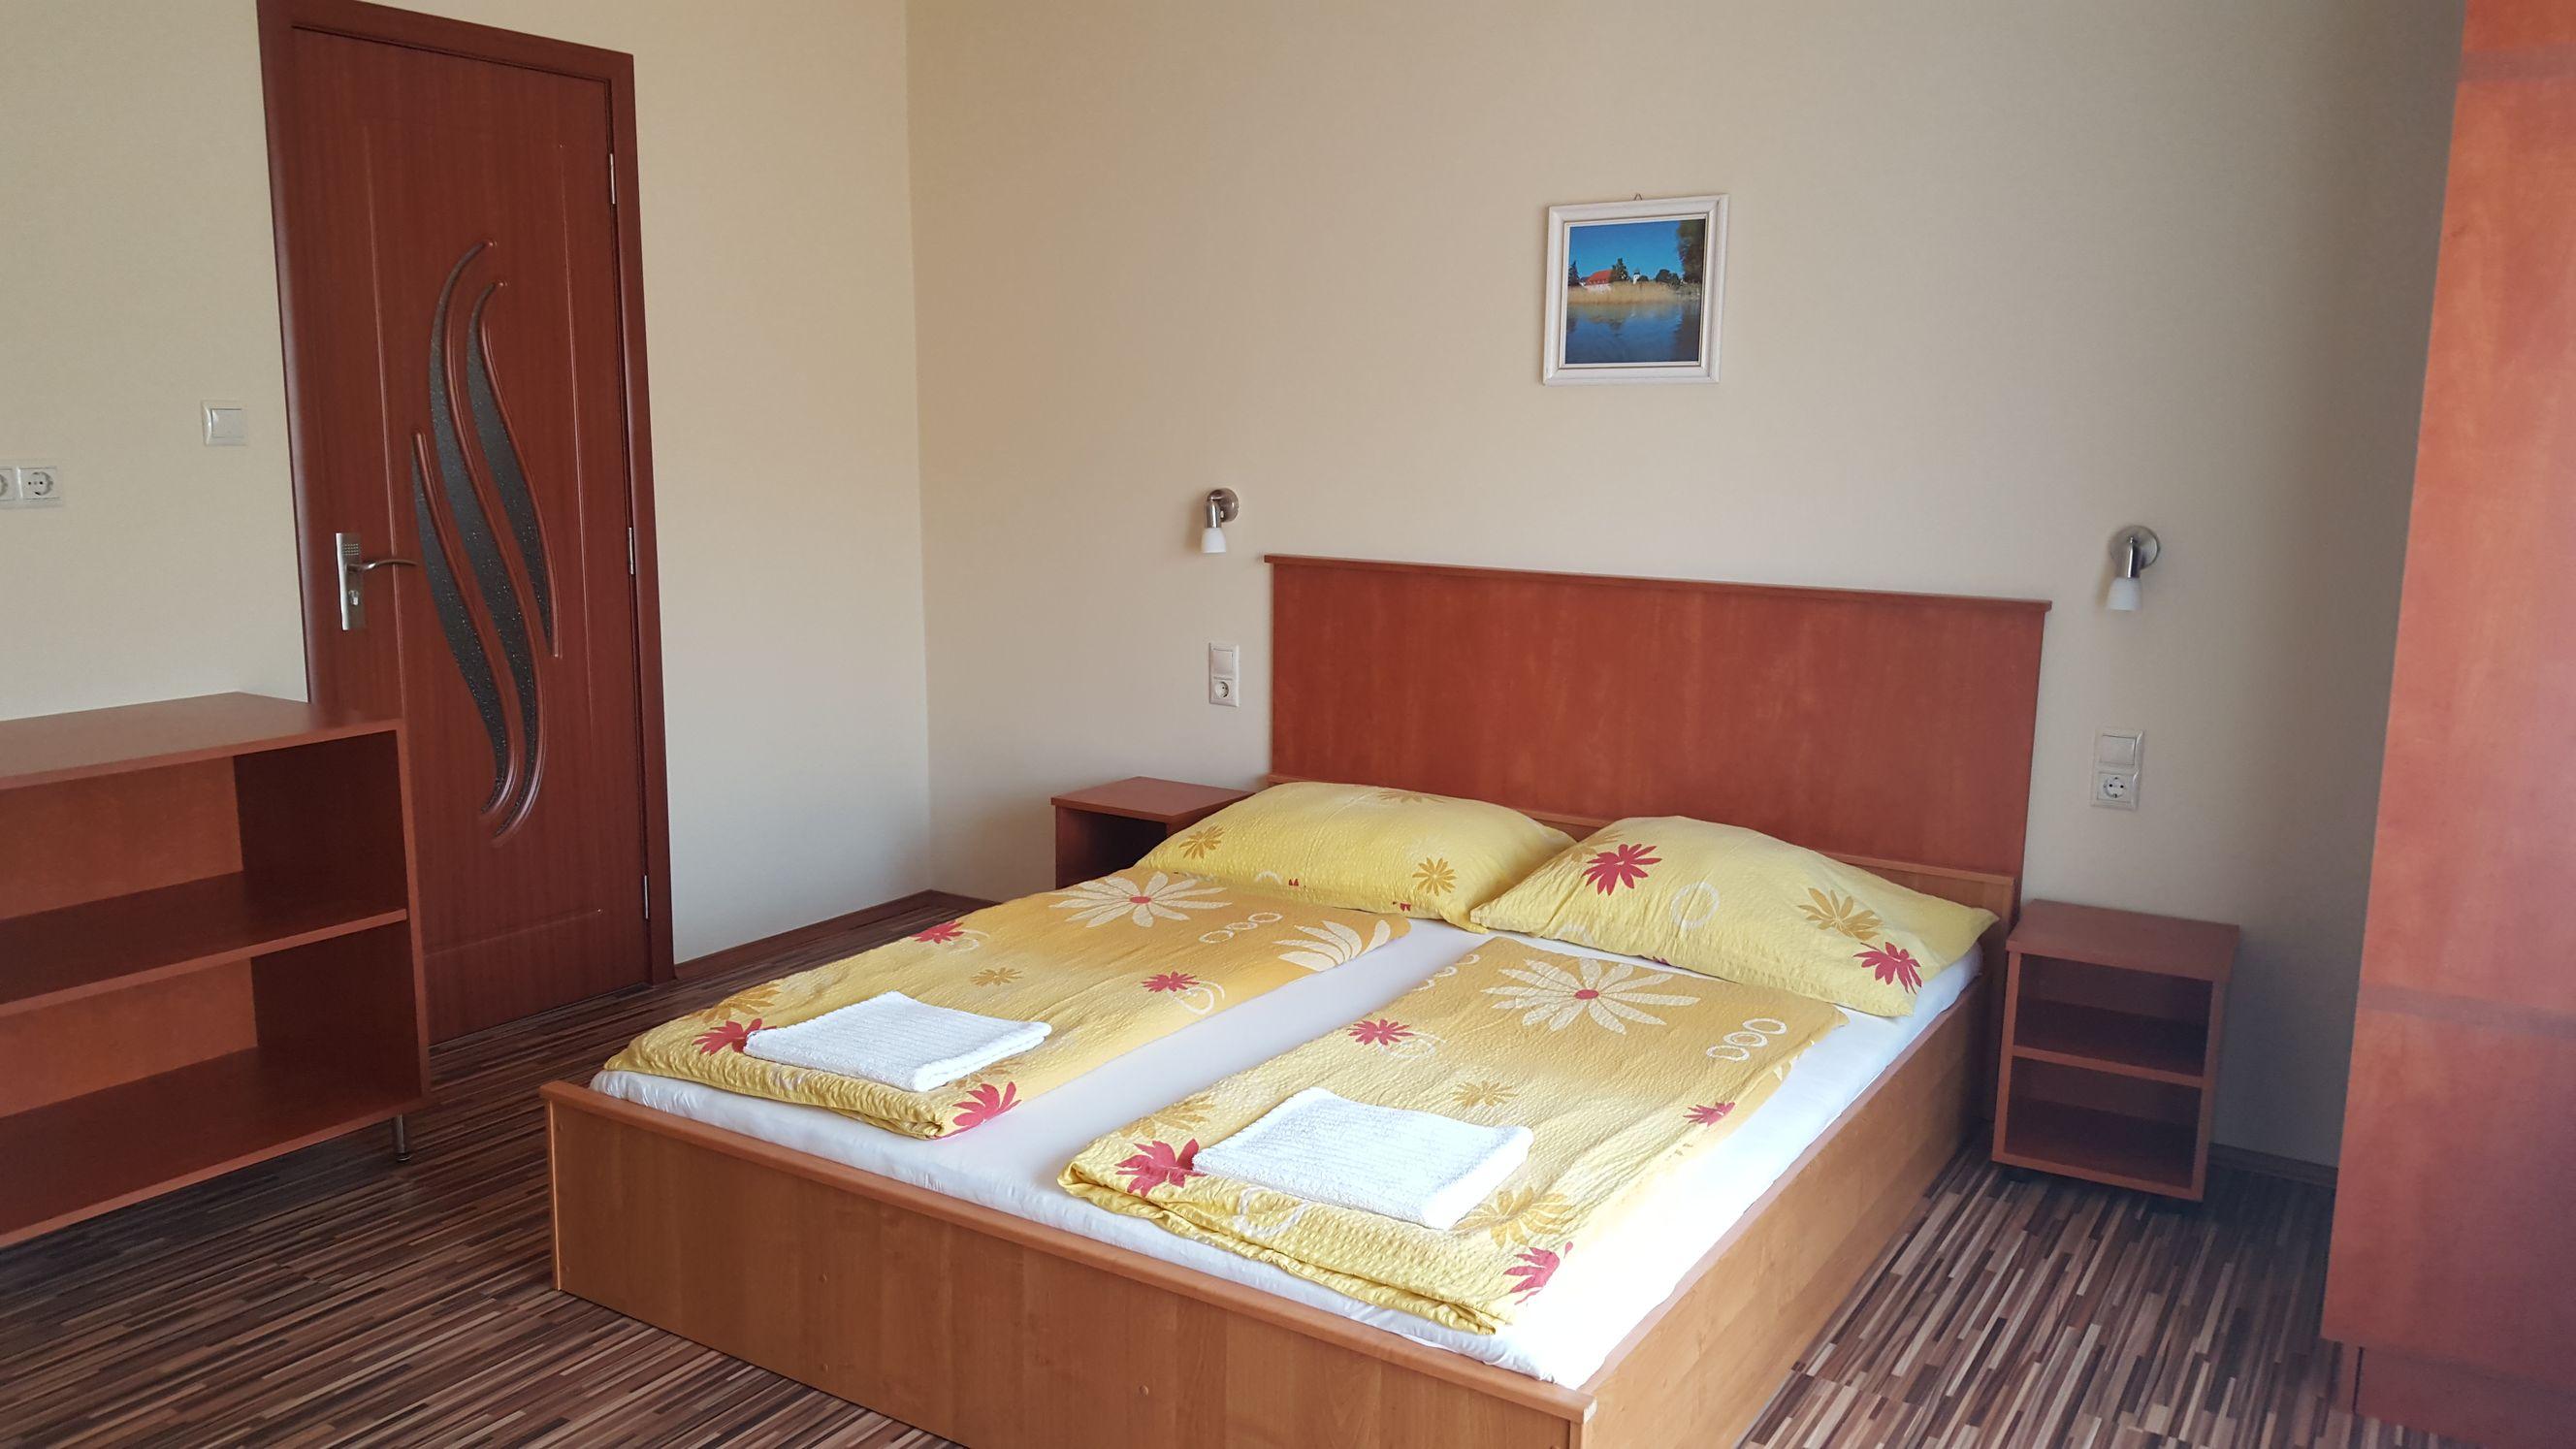 siofok_kiado_apartman_8fo_100nm_8